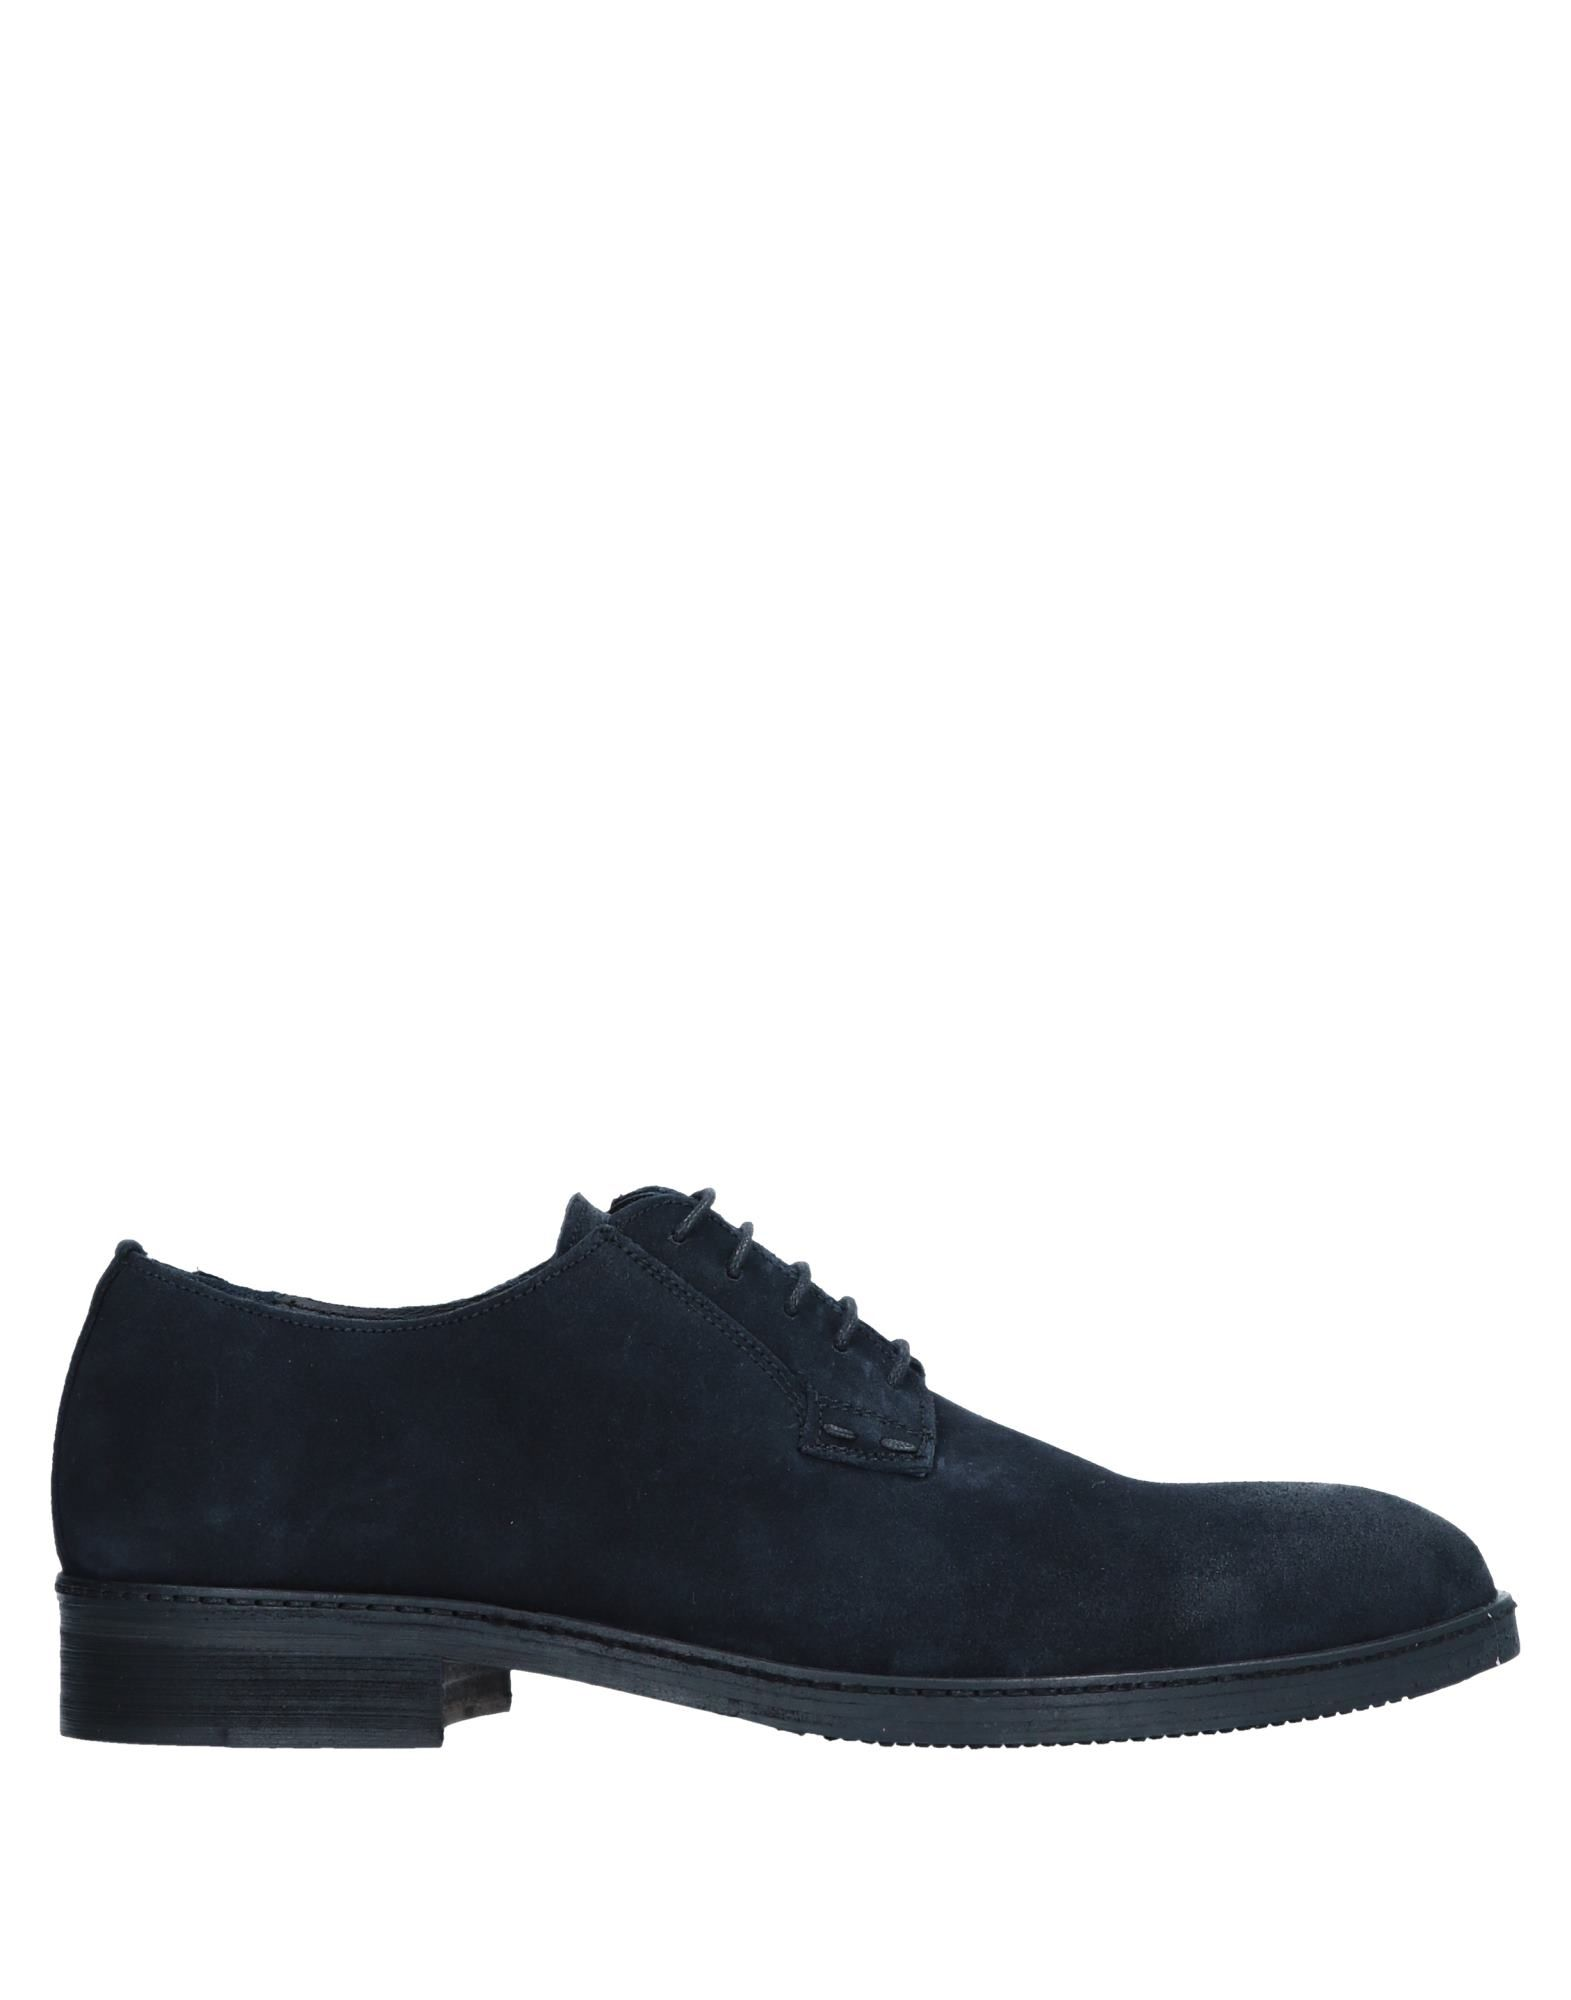 Rabatt echte Schuhe Ton Goût Schnürschuhe Herren 11556970CE